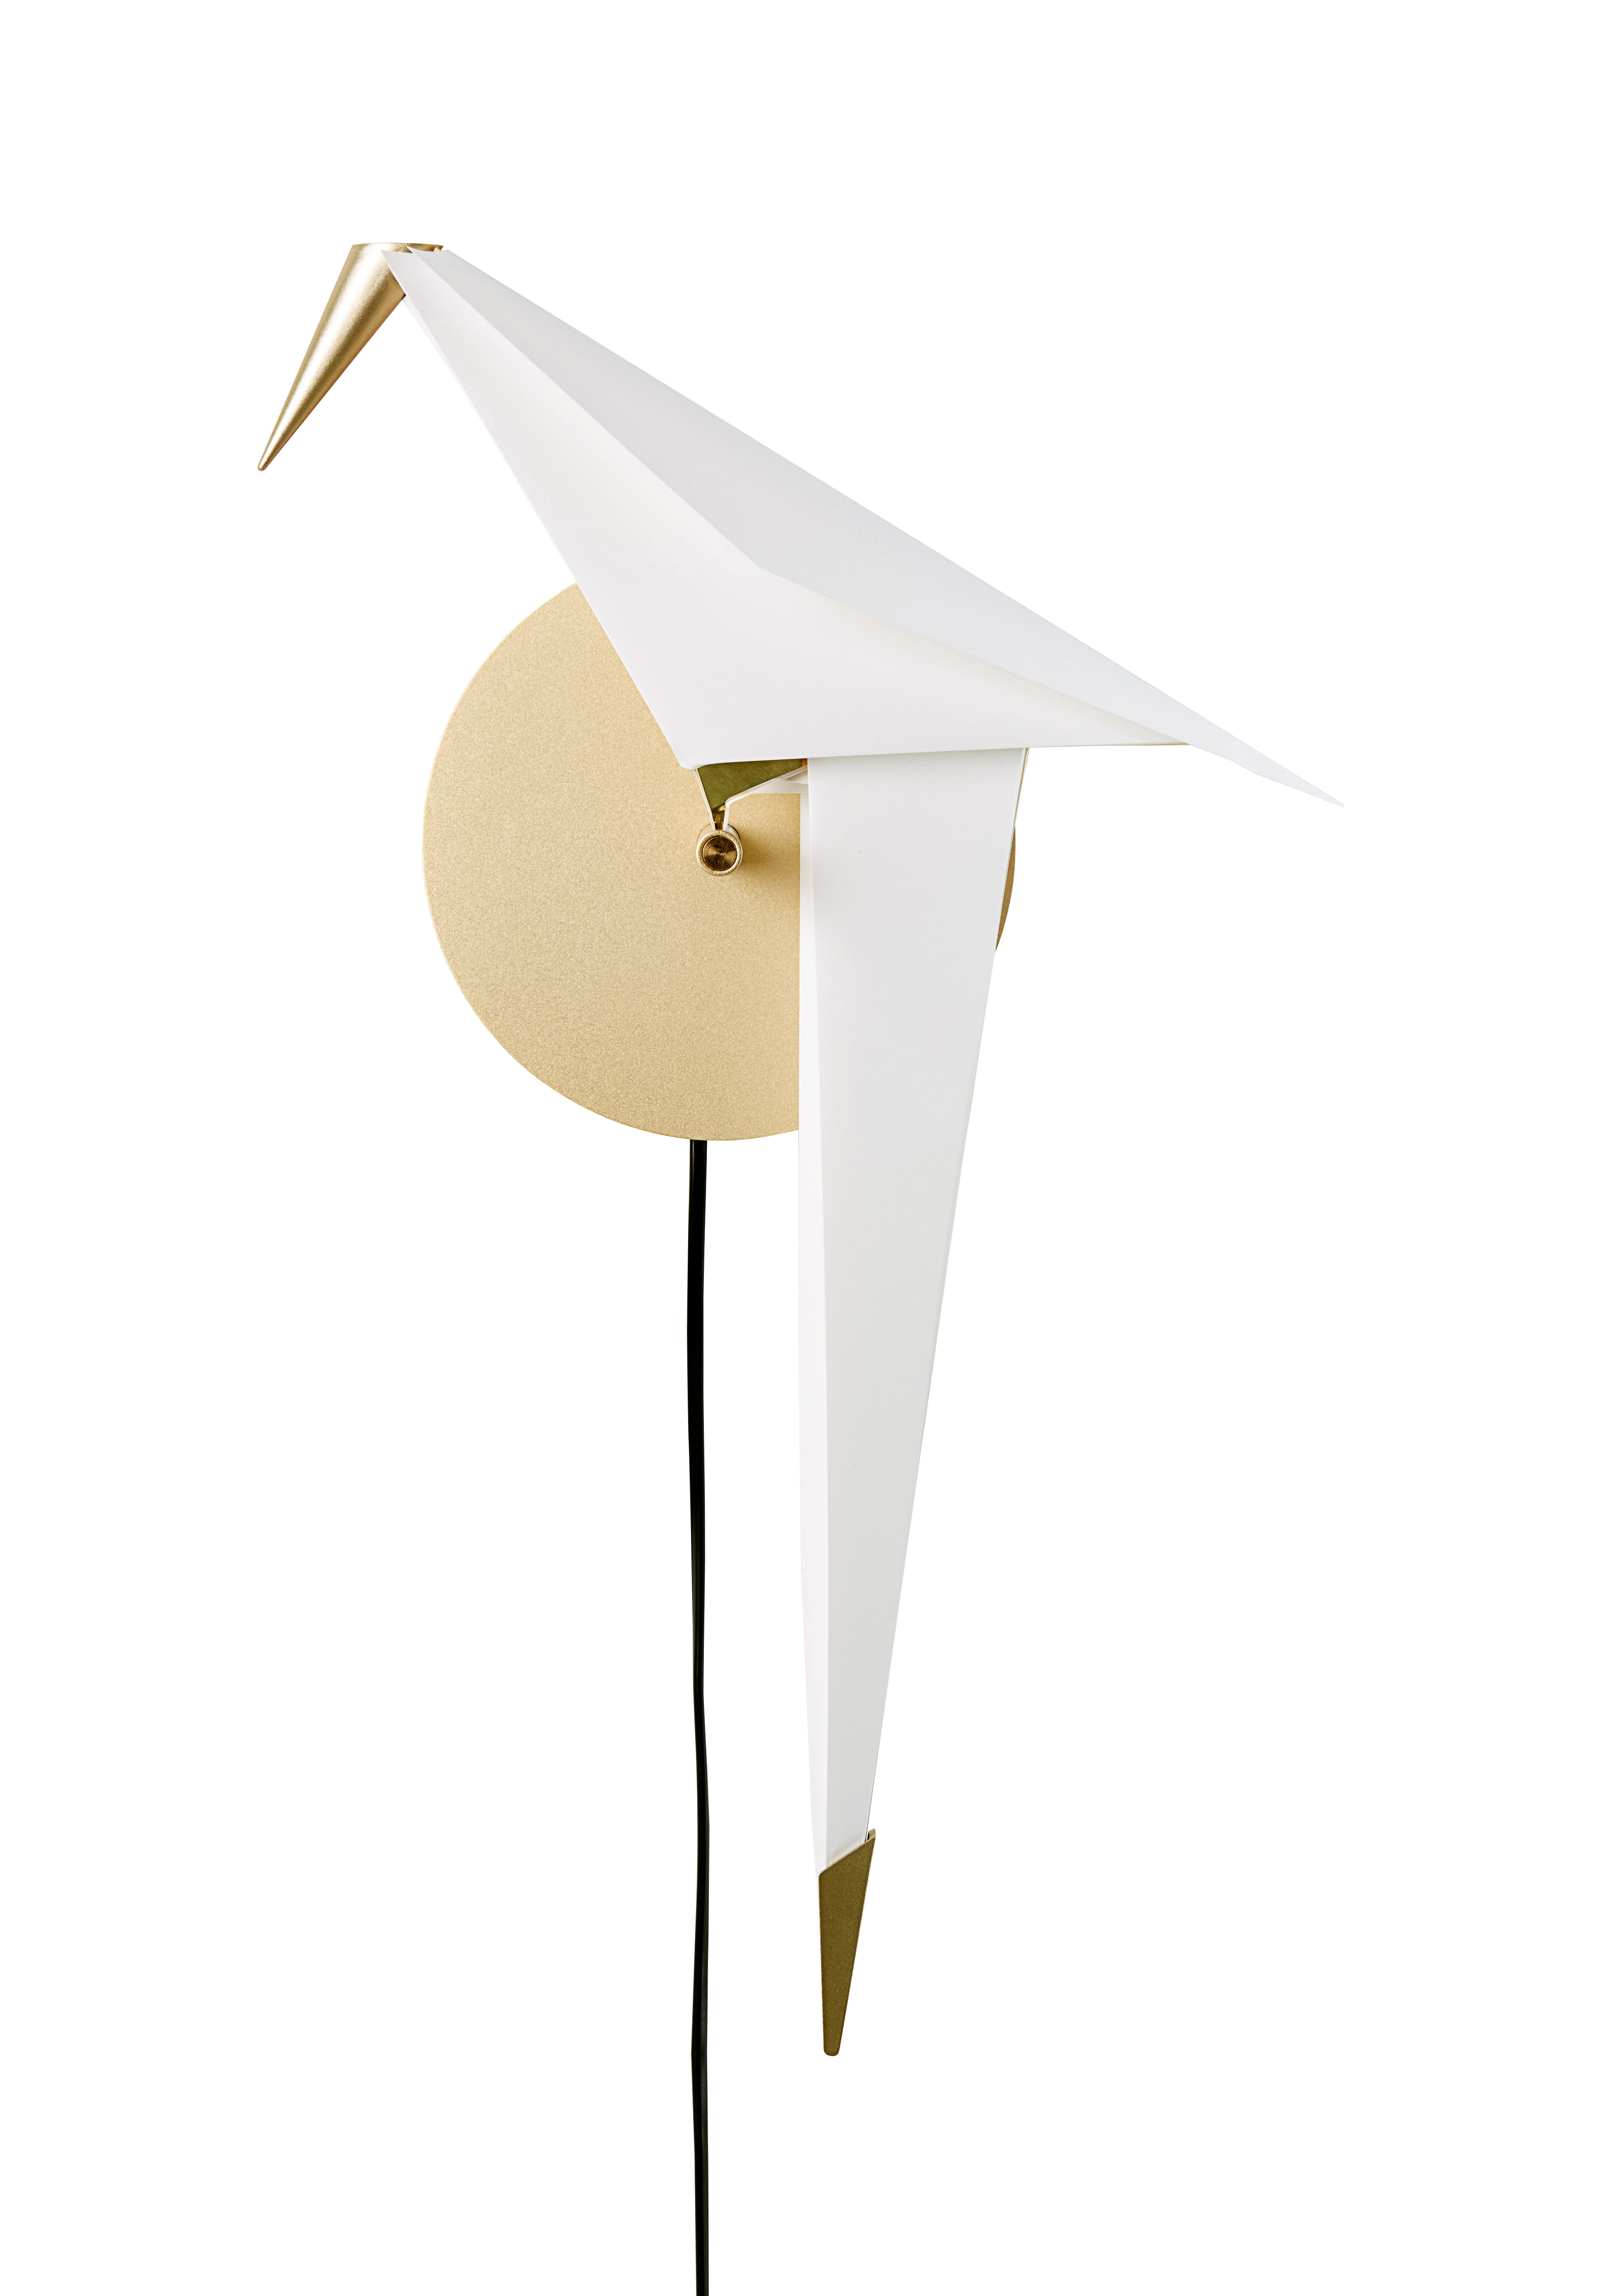 applique avec prise perch light small moooi small 25 cm blanc laiton l 25 x h 41. Black Bedroom Furniture Sets. Home Design Ideas